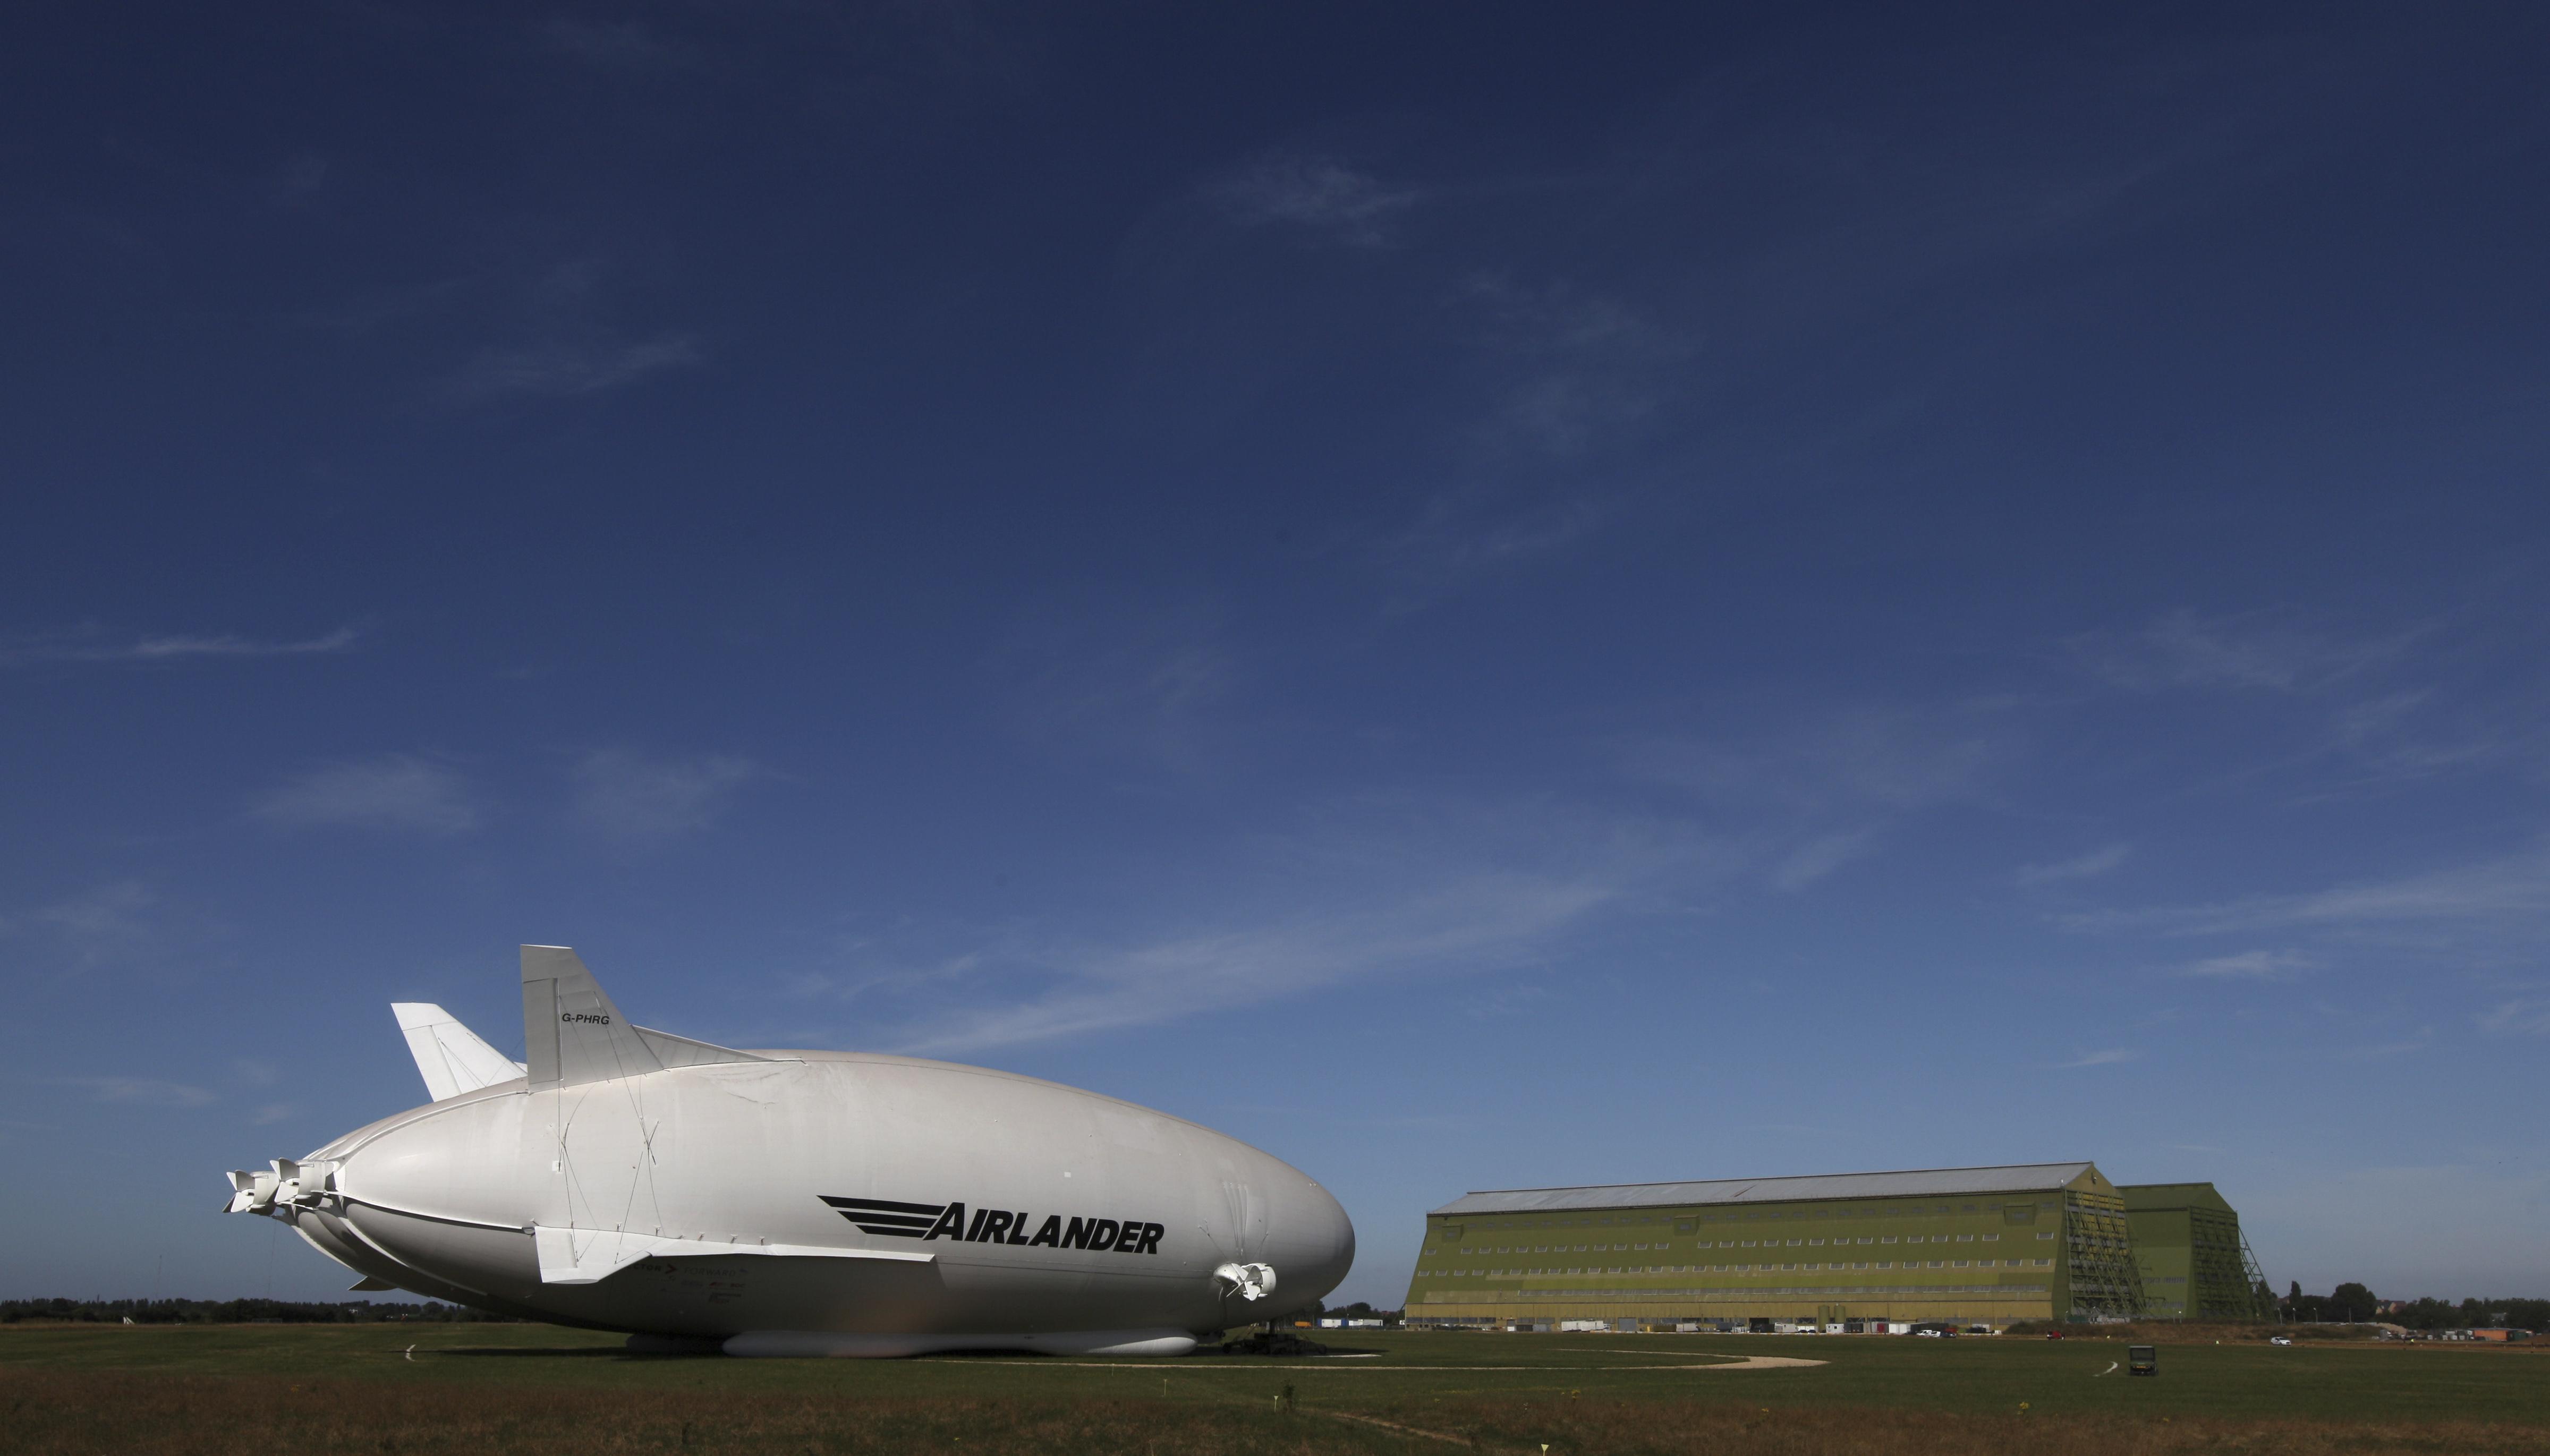 The Airlander 10 hybrid airship is seen at Cardington Airfield